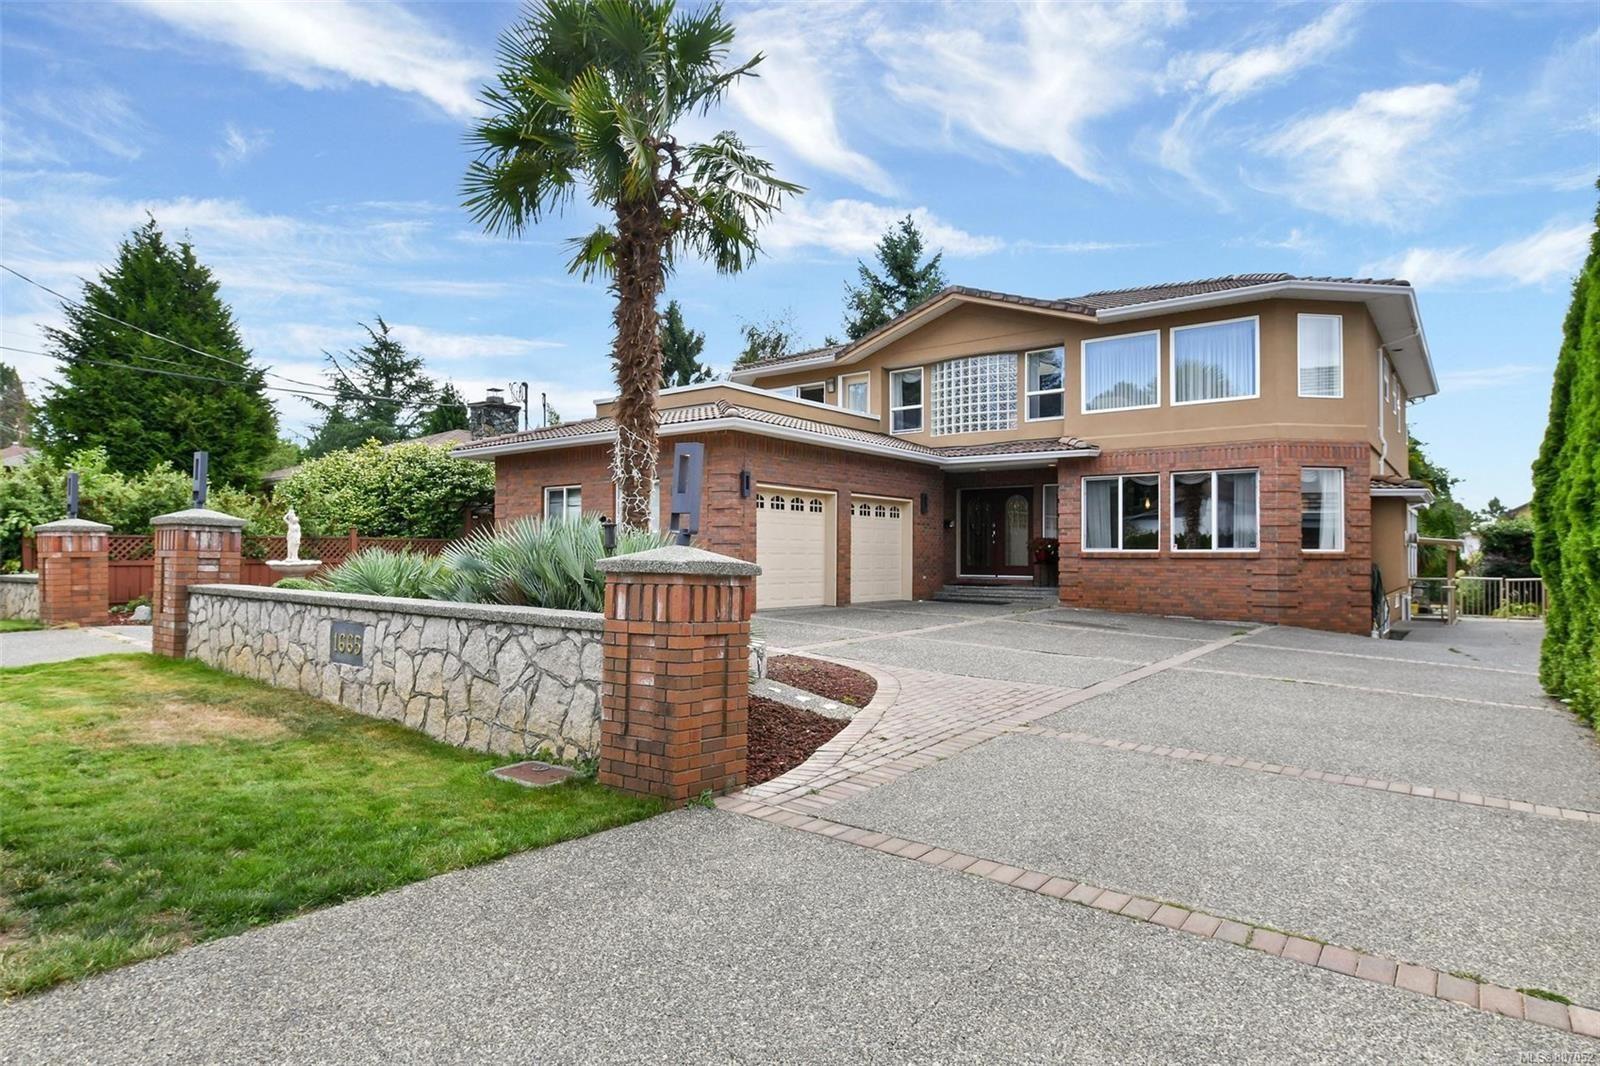 Main Photo: 1665 Ash Rd in Saanich: SE Gordon Head House for sale (Saanich East)  : MLS®# 887052